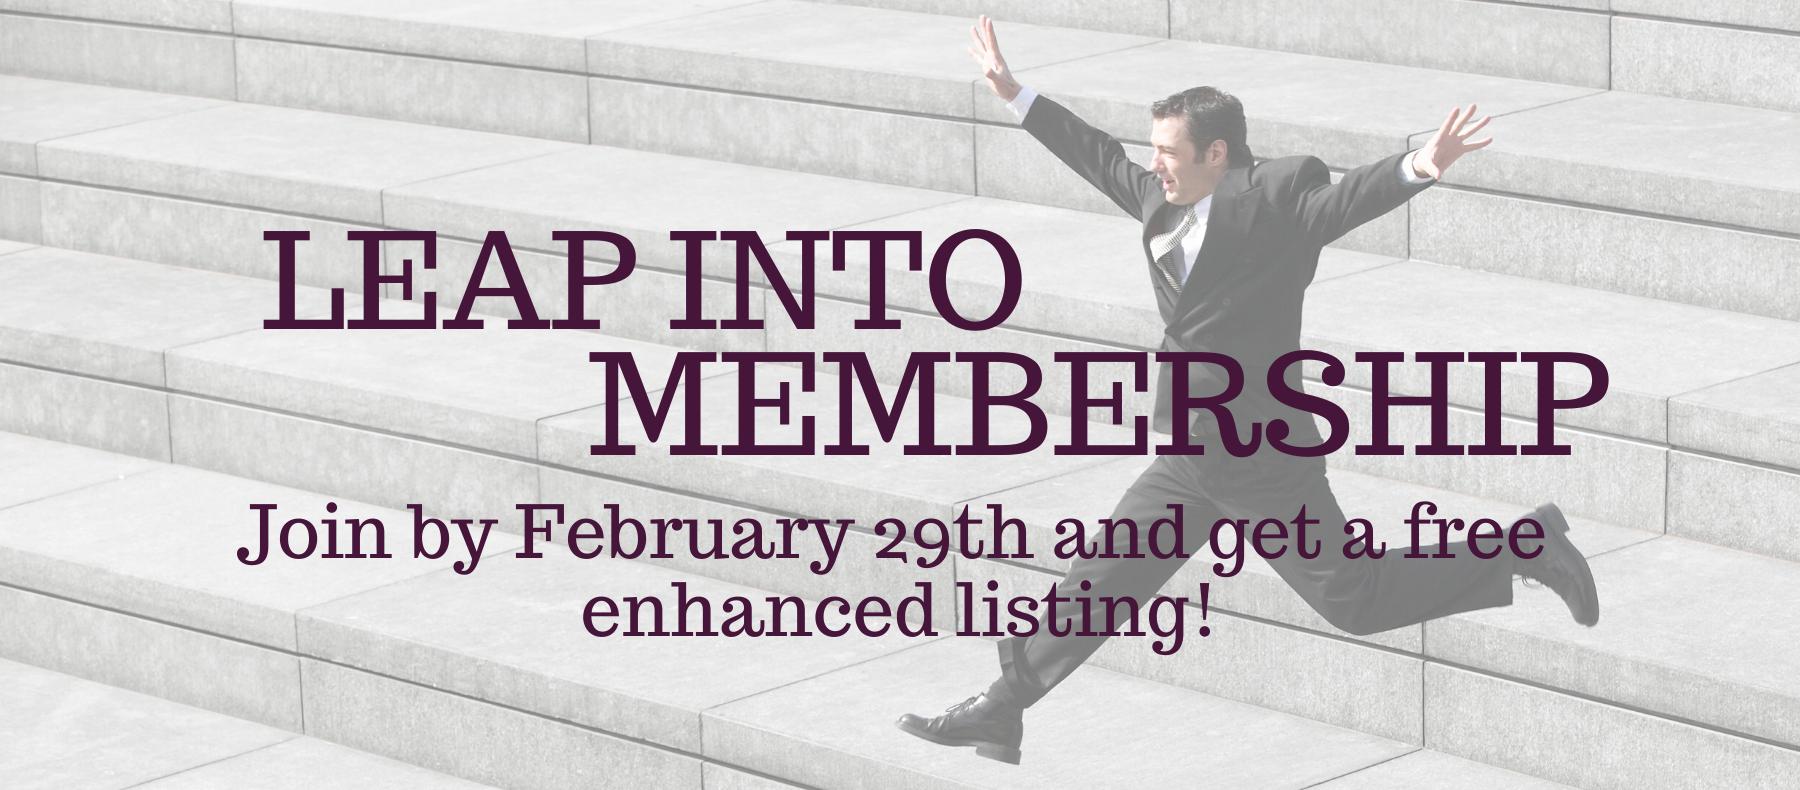 Leap-into-membership.png